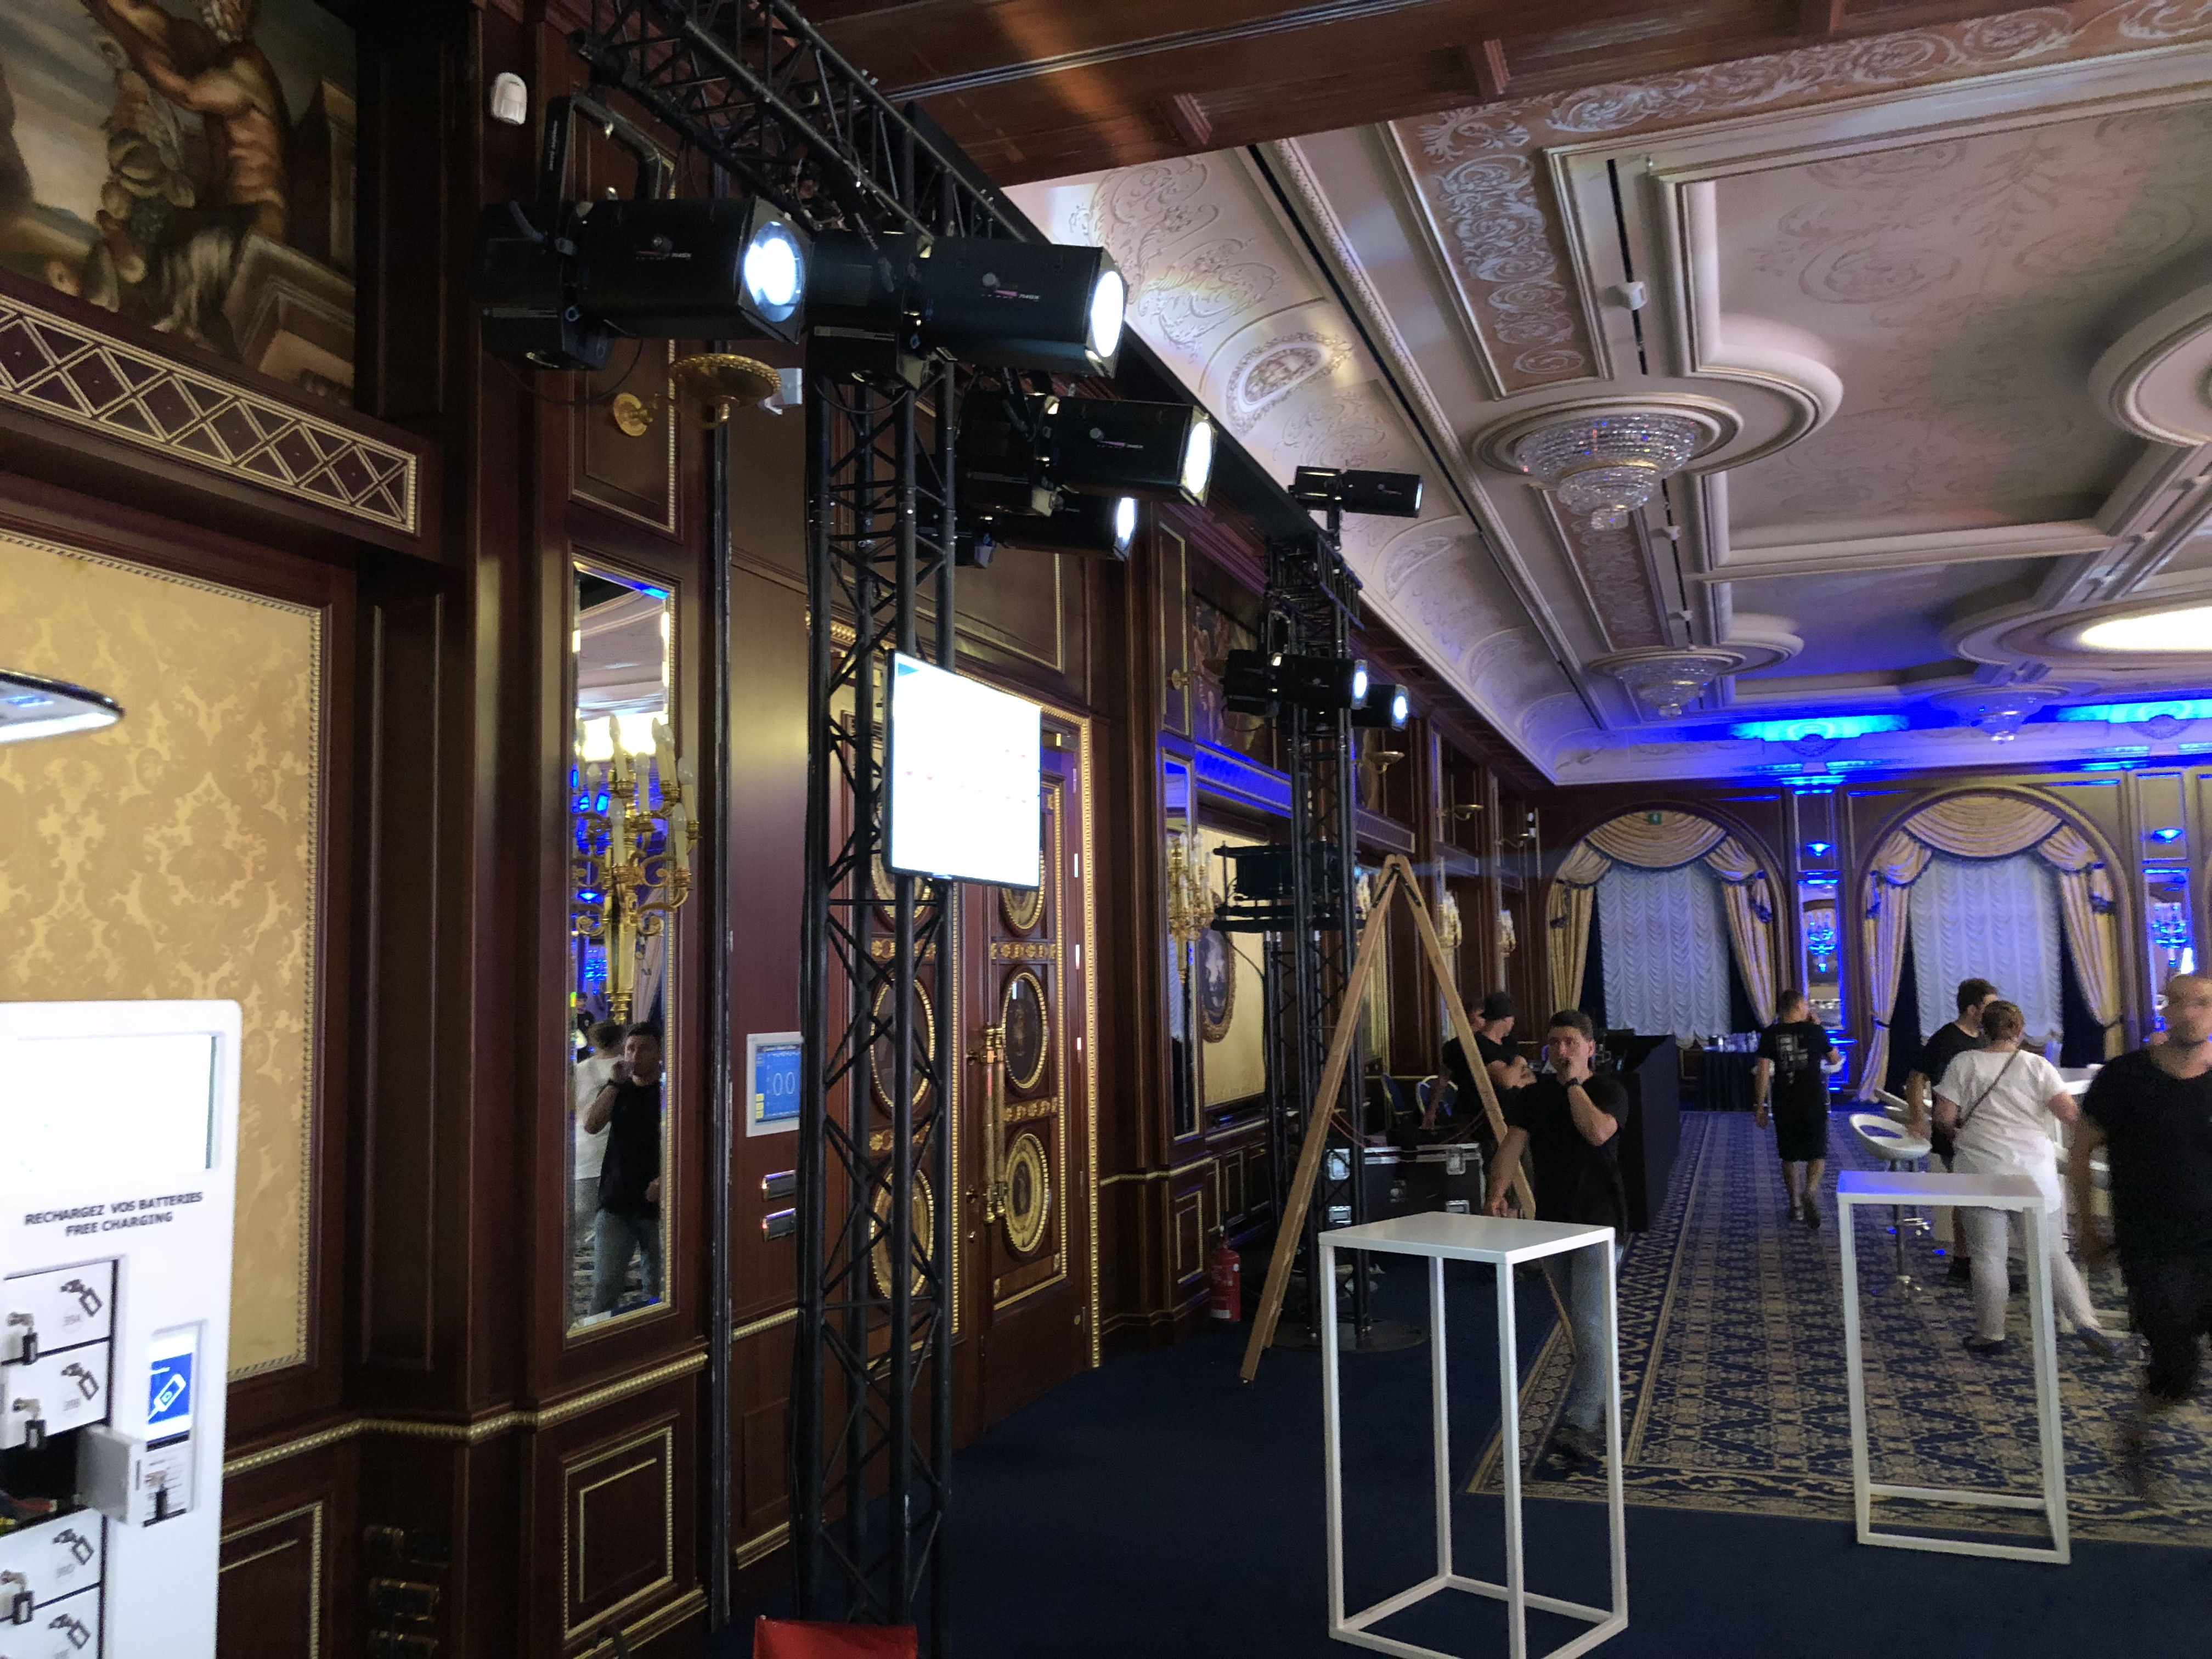 aucop-bnp paribas-event-italie-twobevents-son-video-deco-scene-lac majeur-Grand Hotel Dino